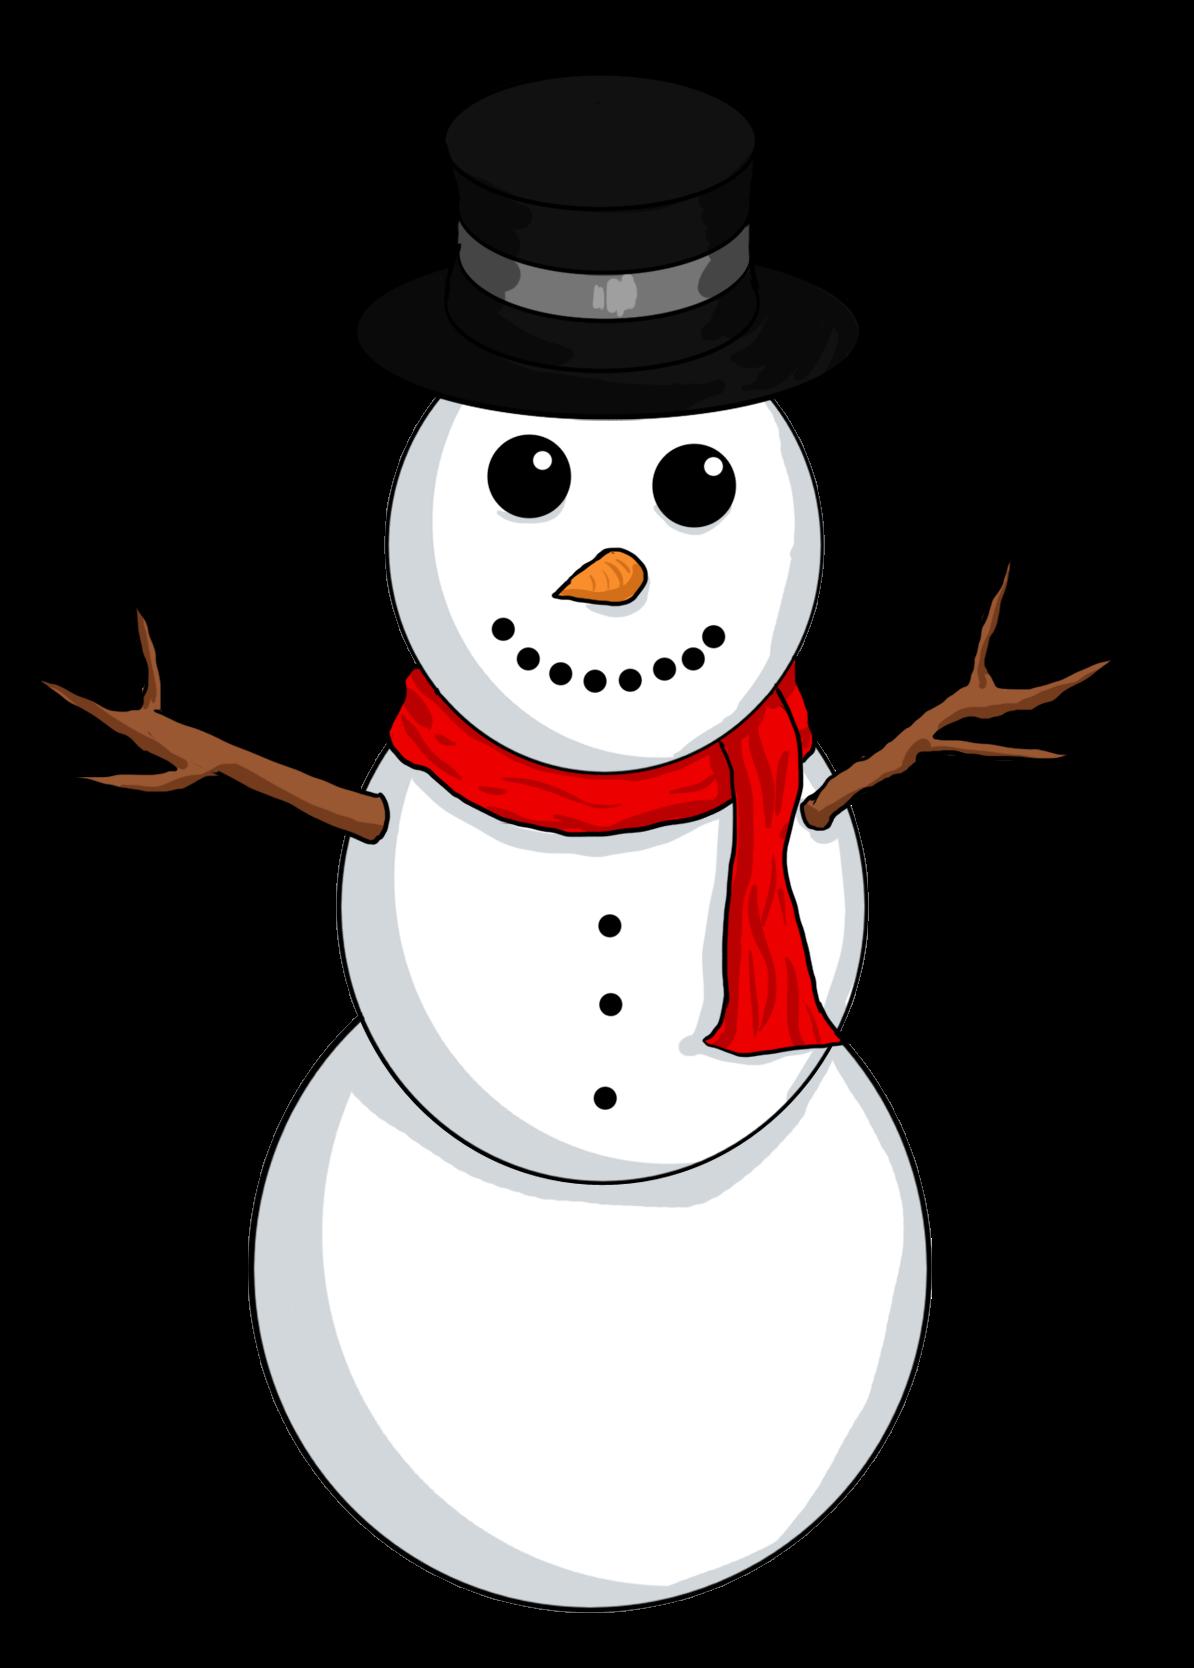 Snowman clipart free illustration image